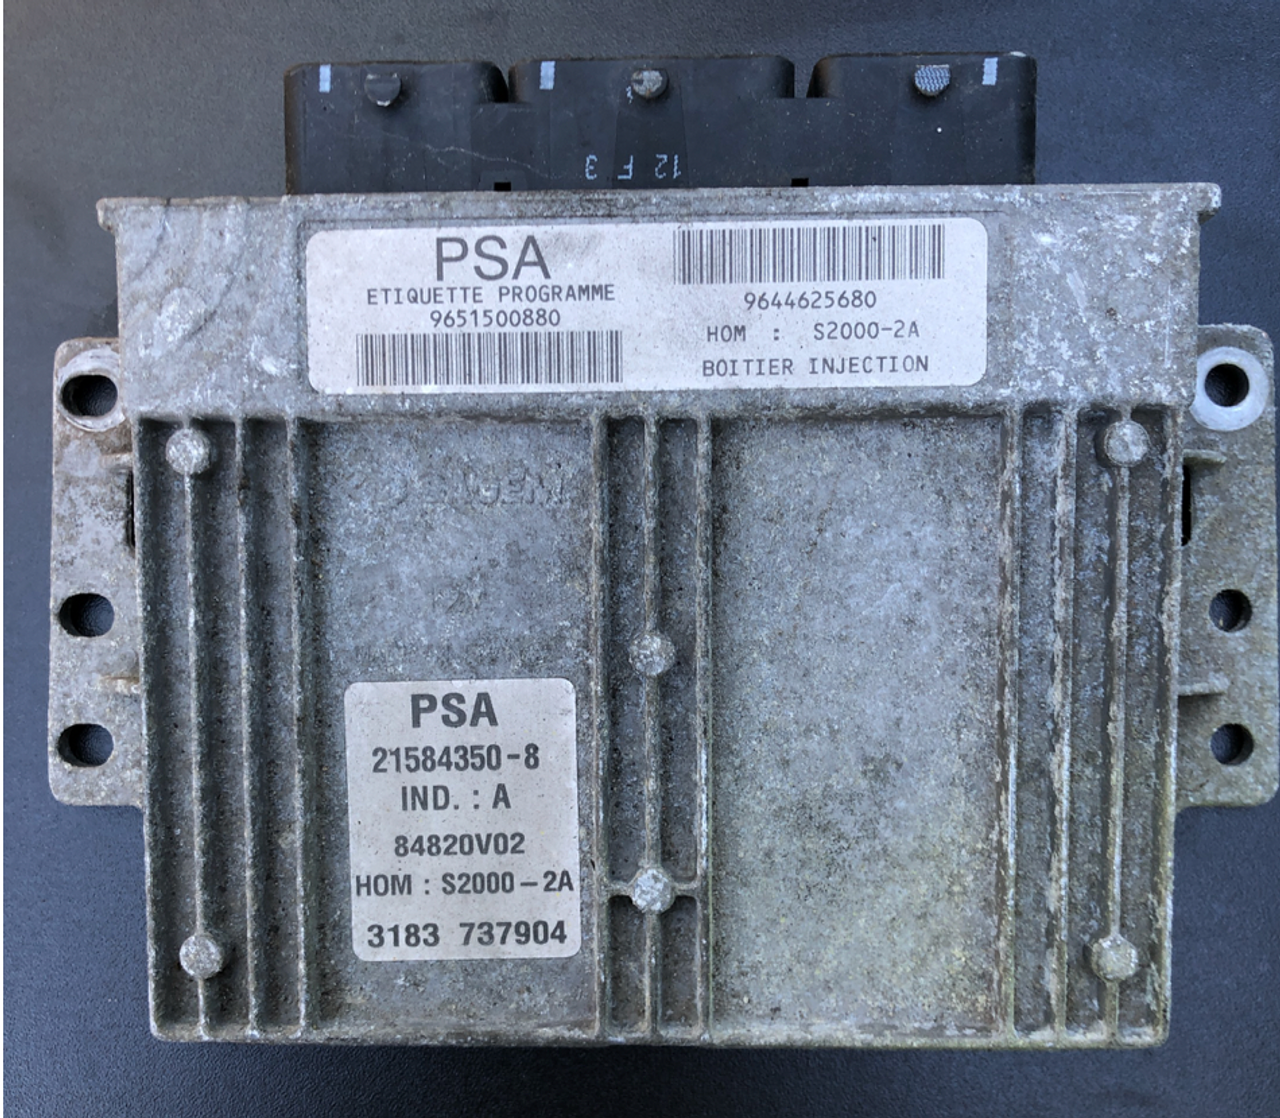 PSA Peugeot/Citroen  S2000-2A 9651500880 9644625680 21584350-8